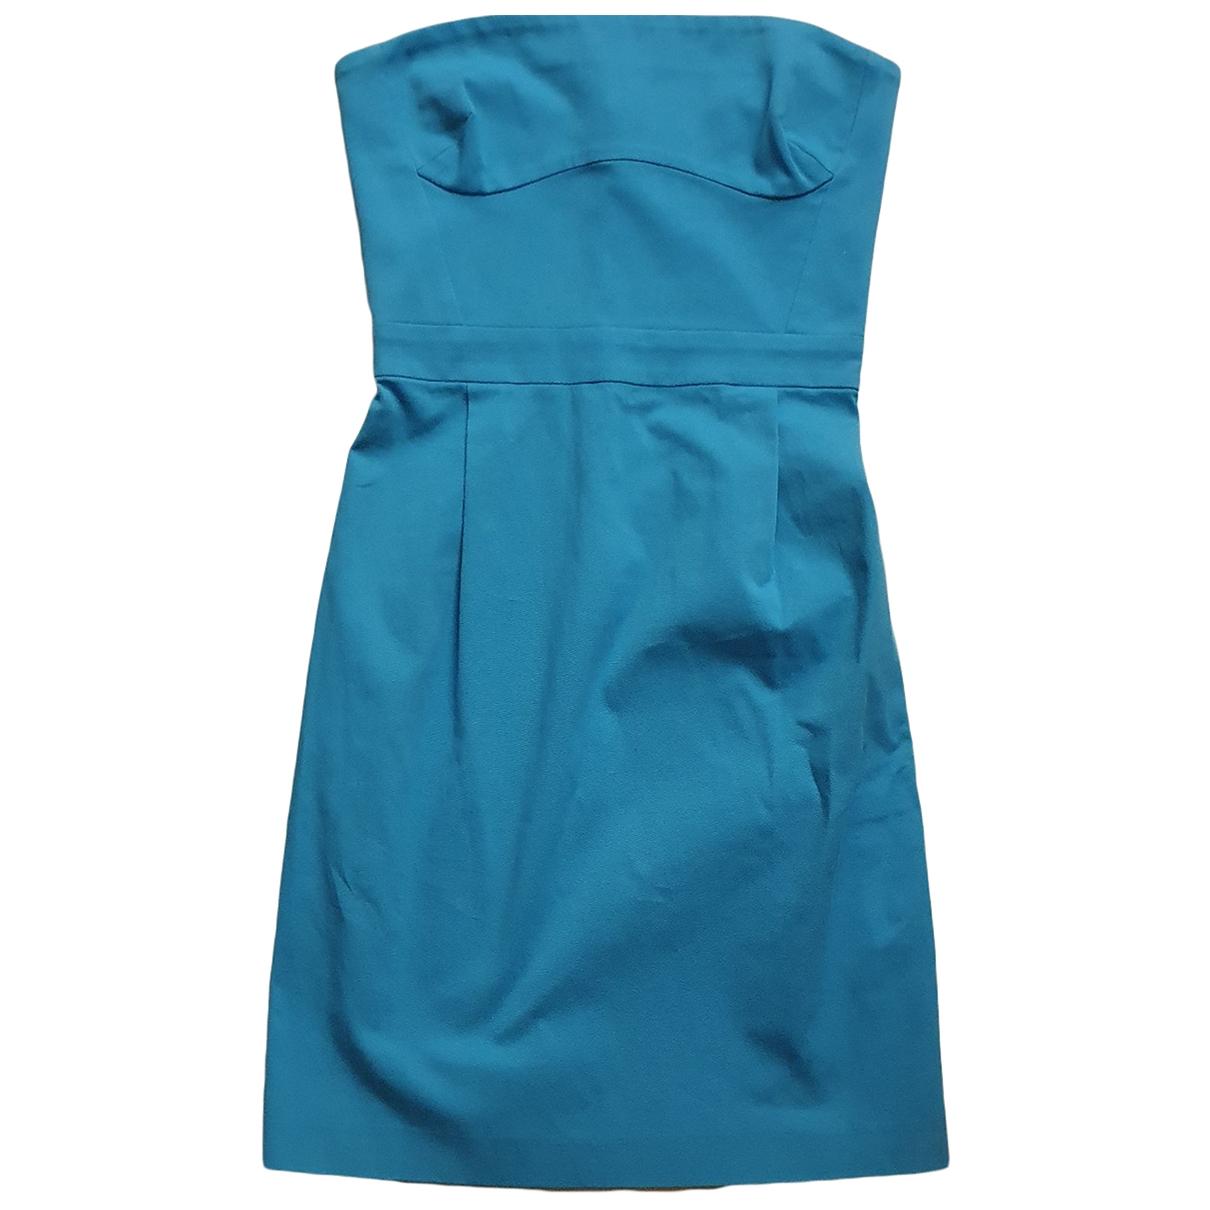 Roberto Cavalli - Robe   pour femme en coton - elasthane - bleu